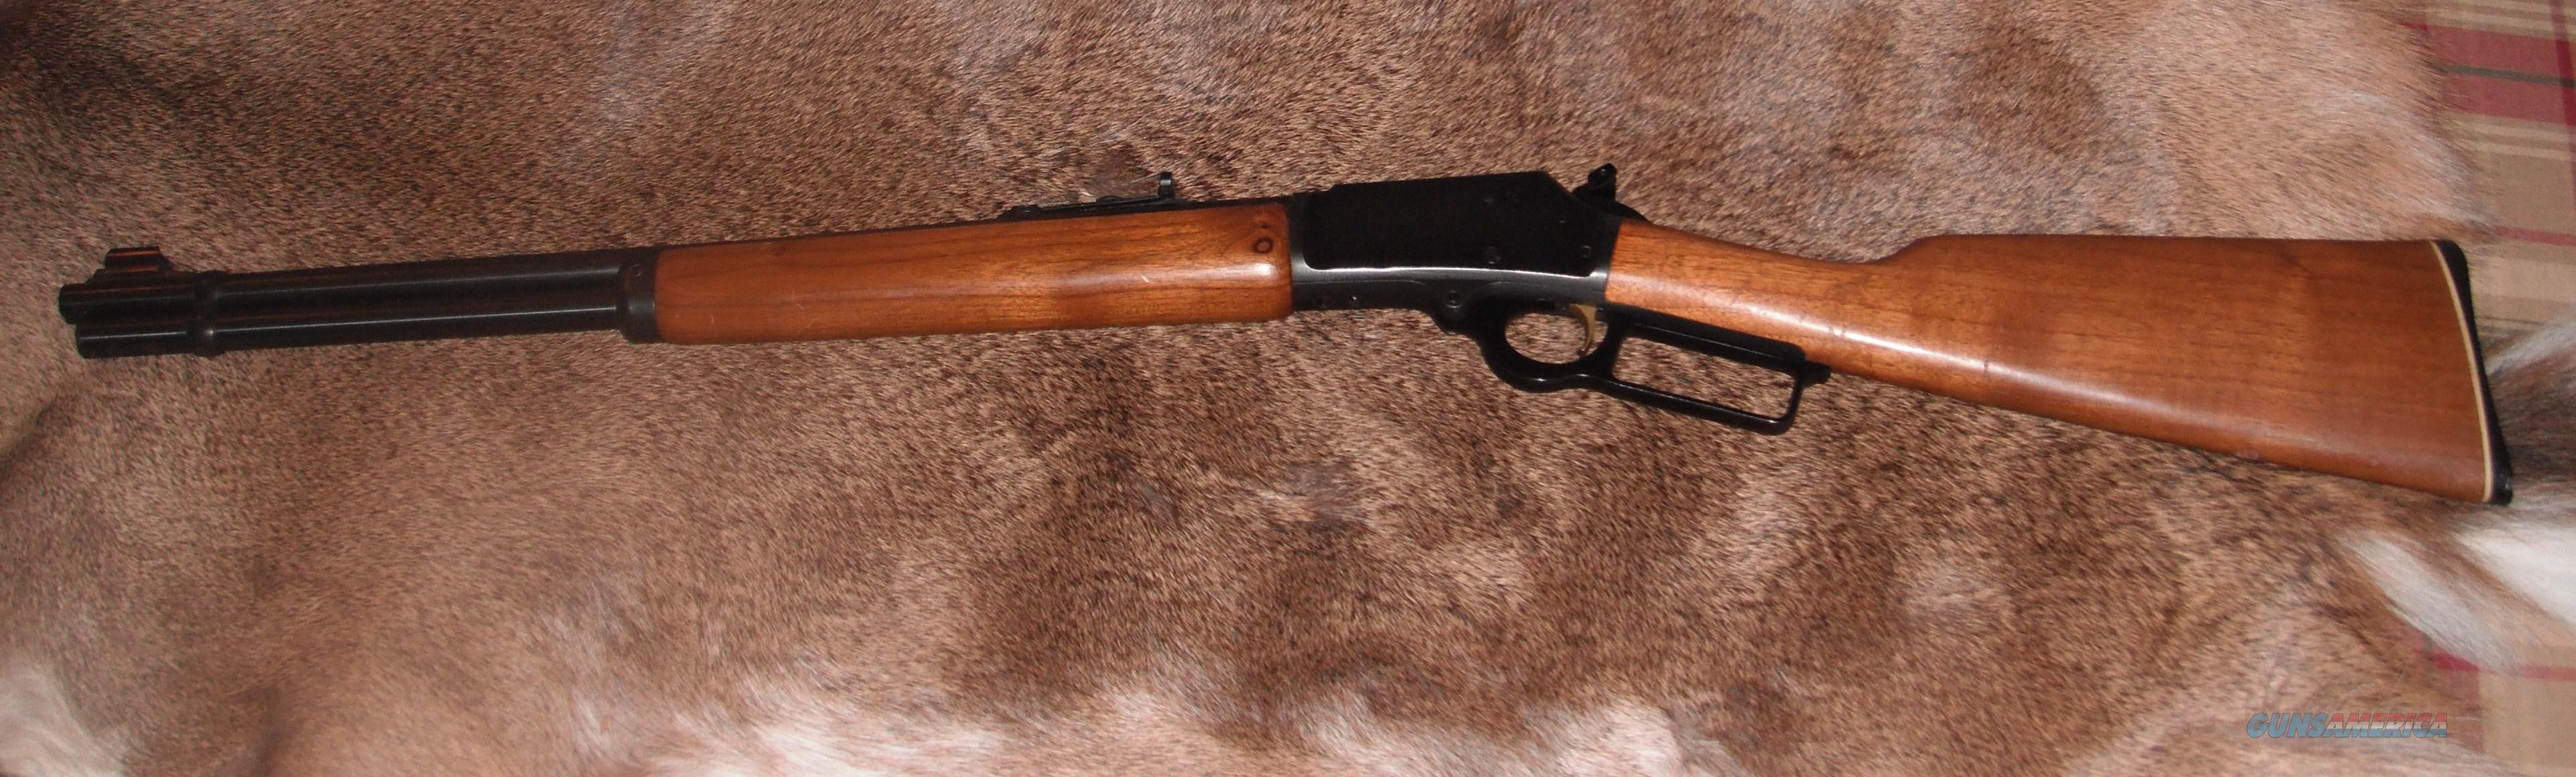 Marlin 1894 in 44 magnum guns gt rifles gt marlin rifles gt modern